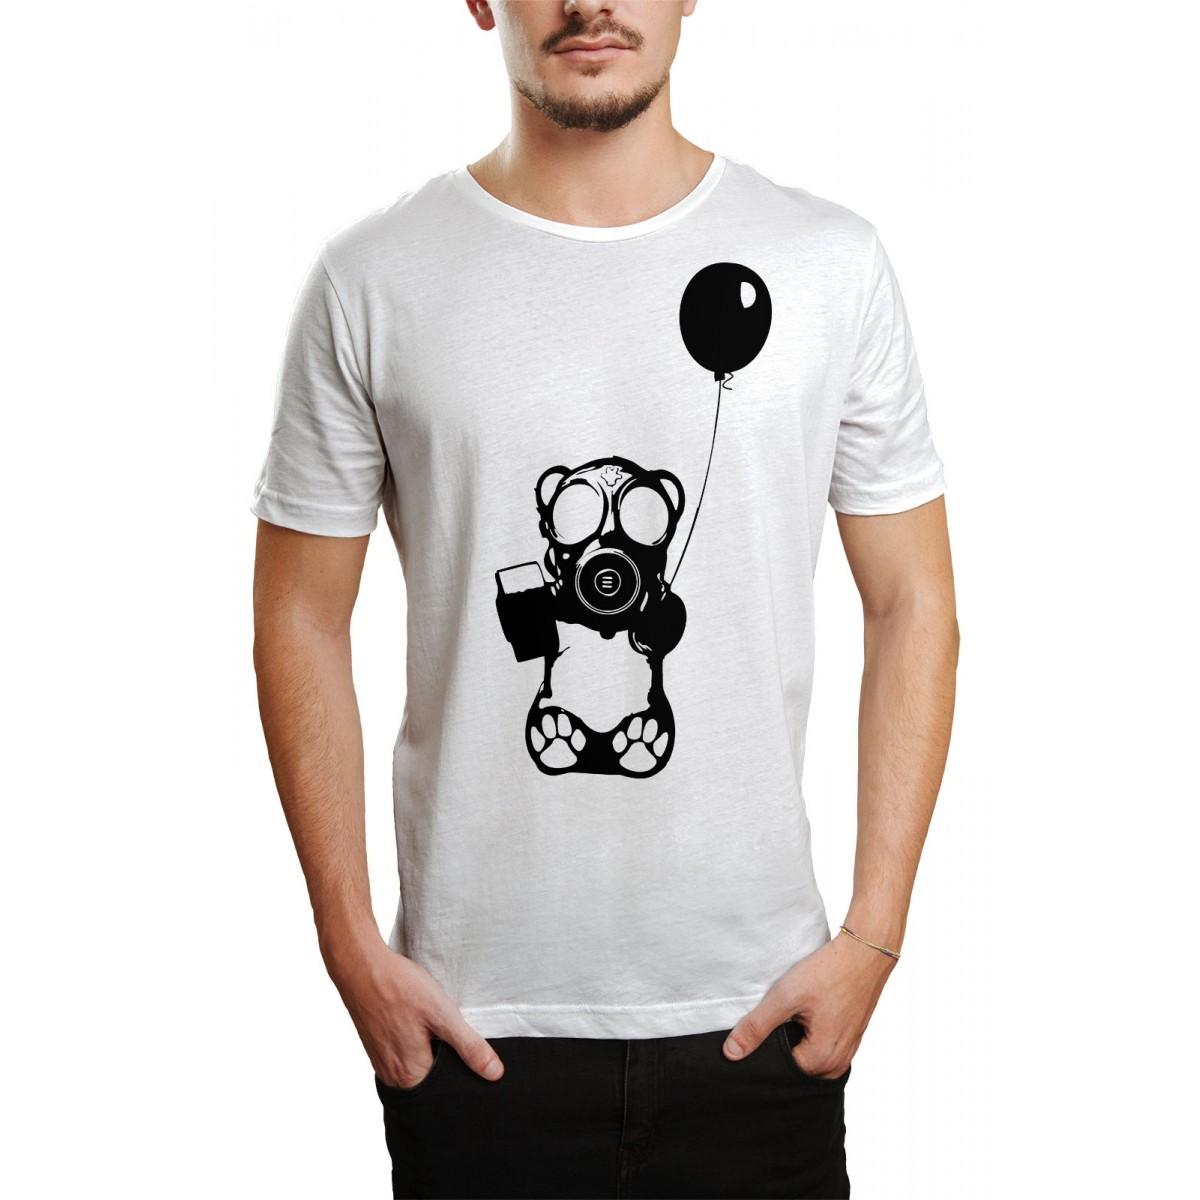 Camiseta HShop Bear Balloon Branco  - HShop